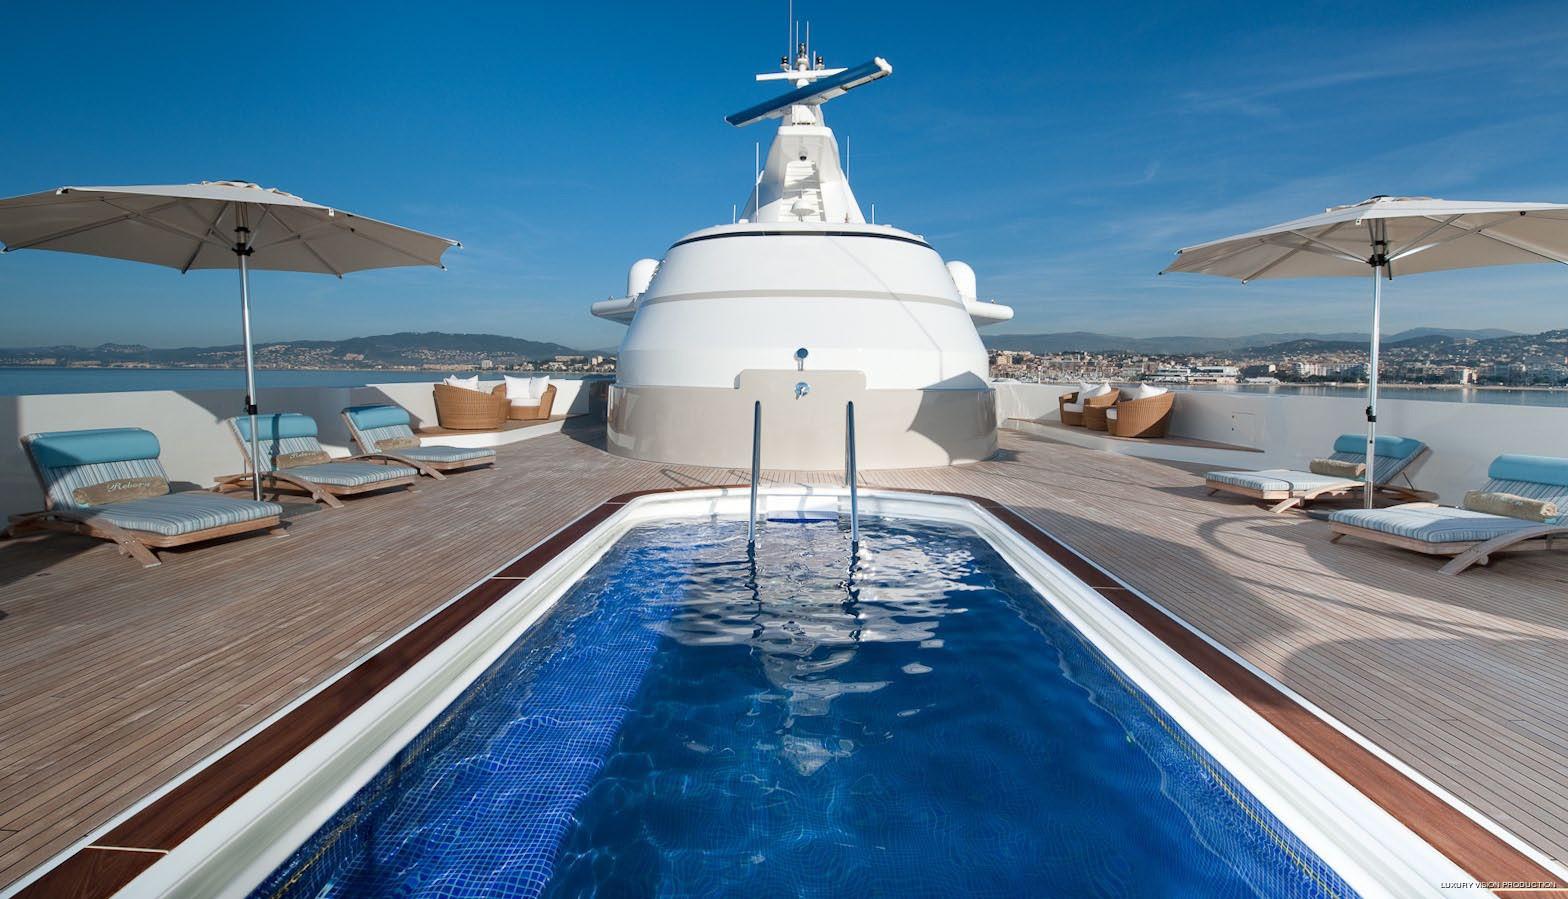 Alquiler de barcos baratos en Ibiza. Yates de alquiler en Ibiza